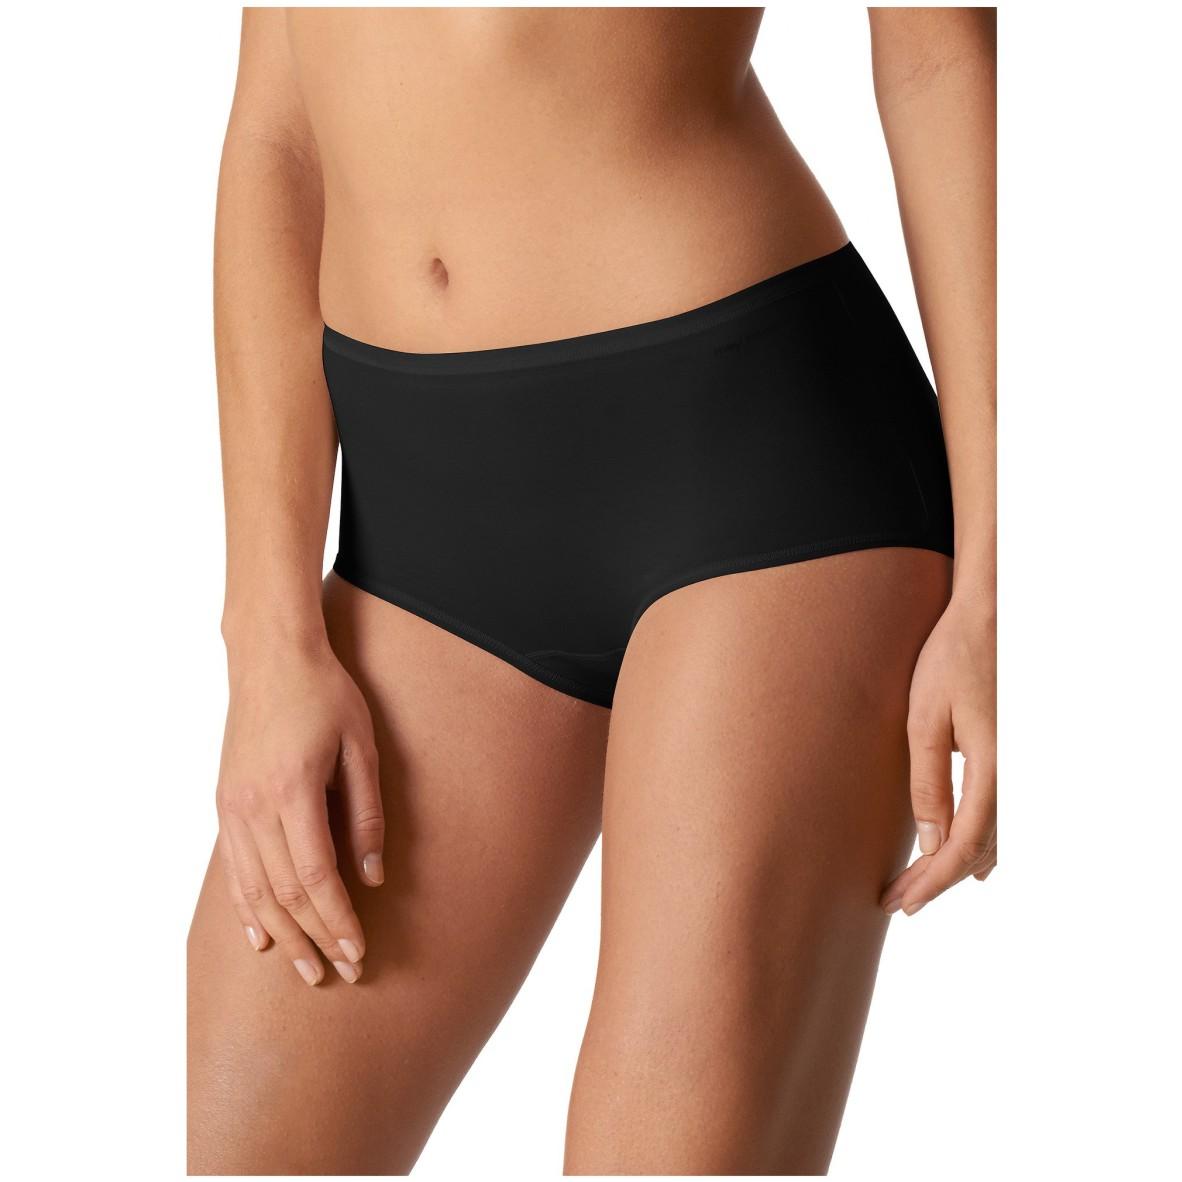 Damen Slip Panty Organic Bio-Baumwolle Mey